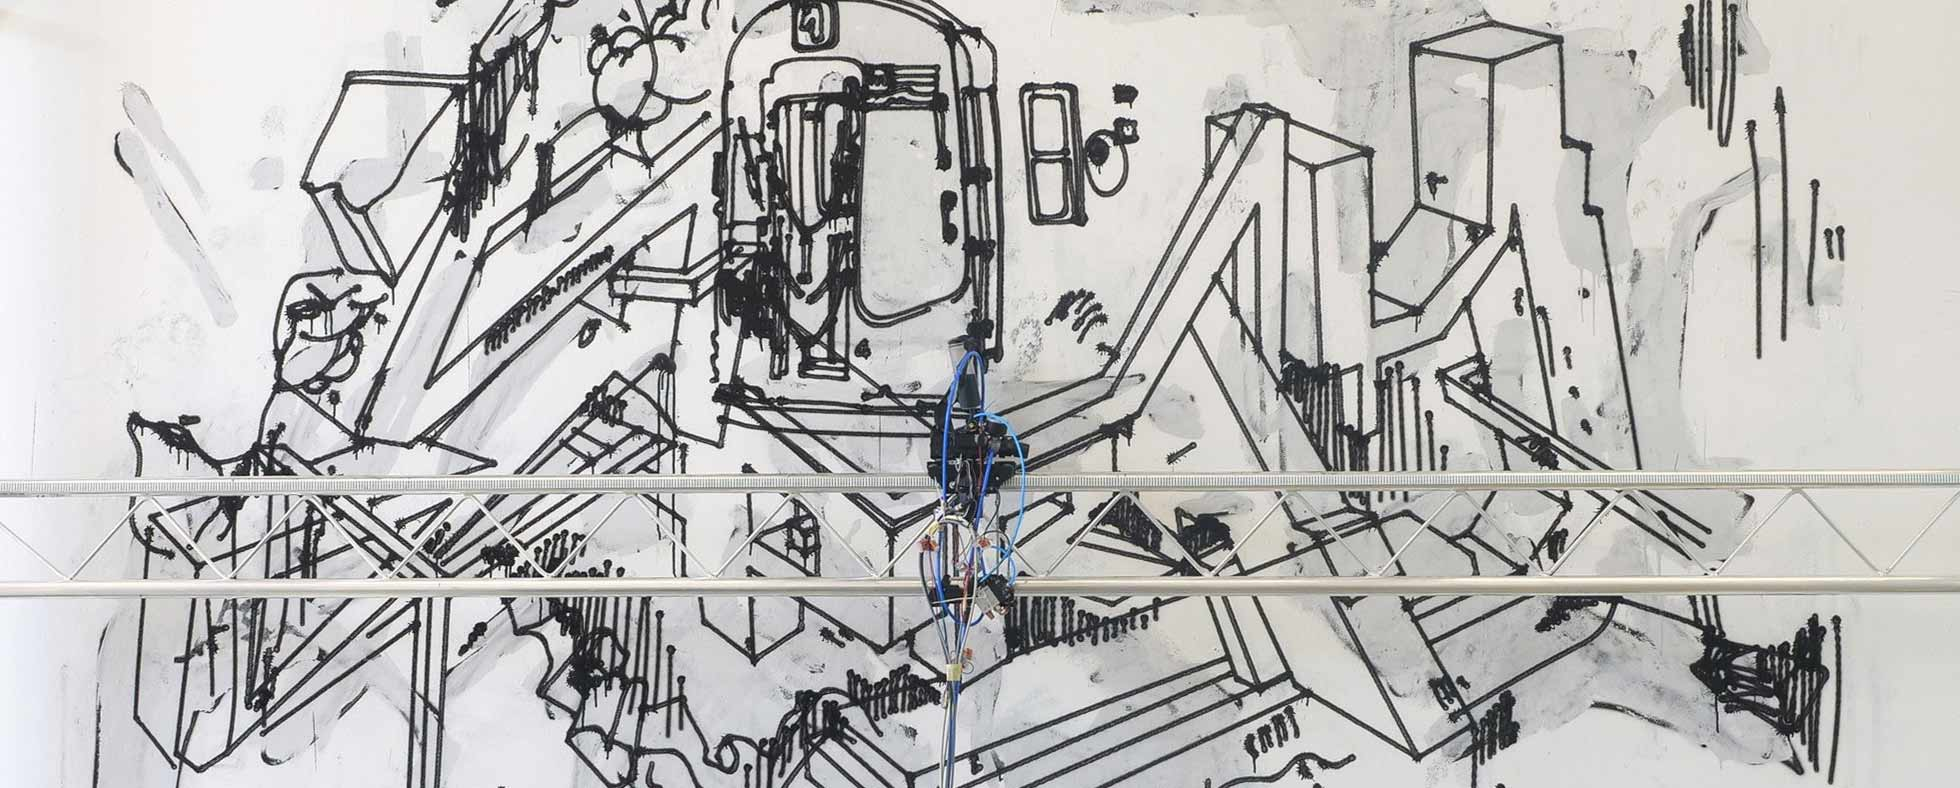 Sprengel Museum Hannover Spray Graffiti Schriftzug